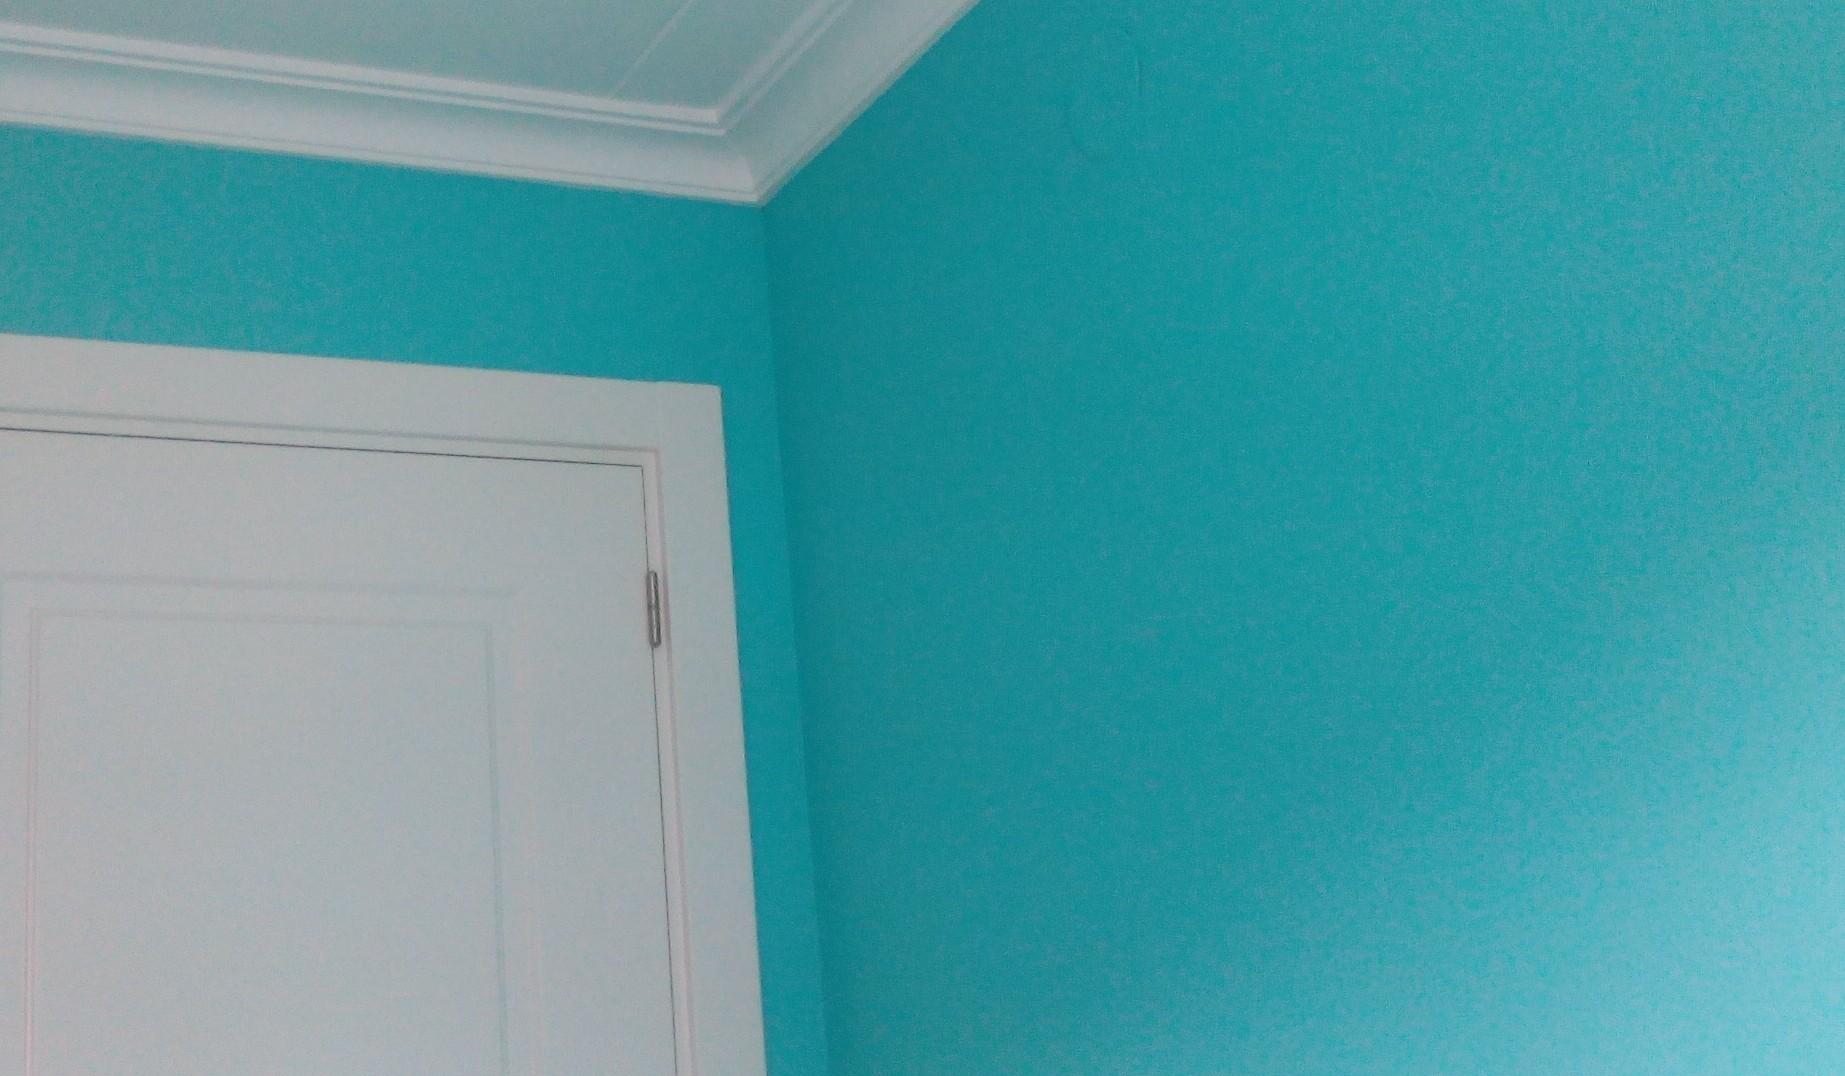 C mo quitar el gotel de las paredes - Quitar pintura de pared ...